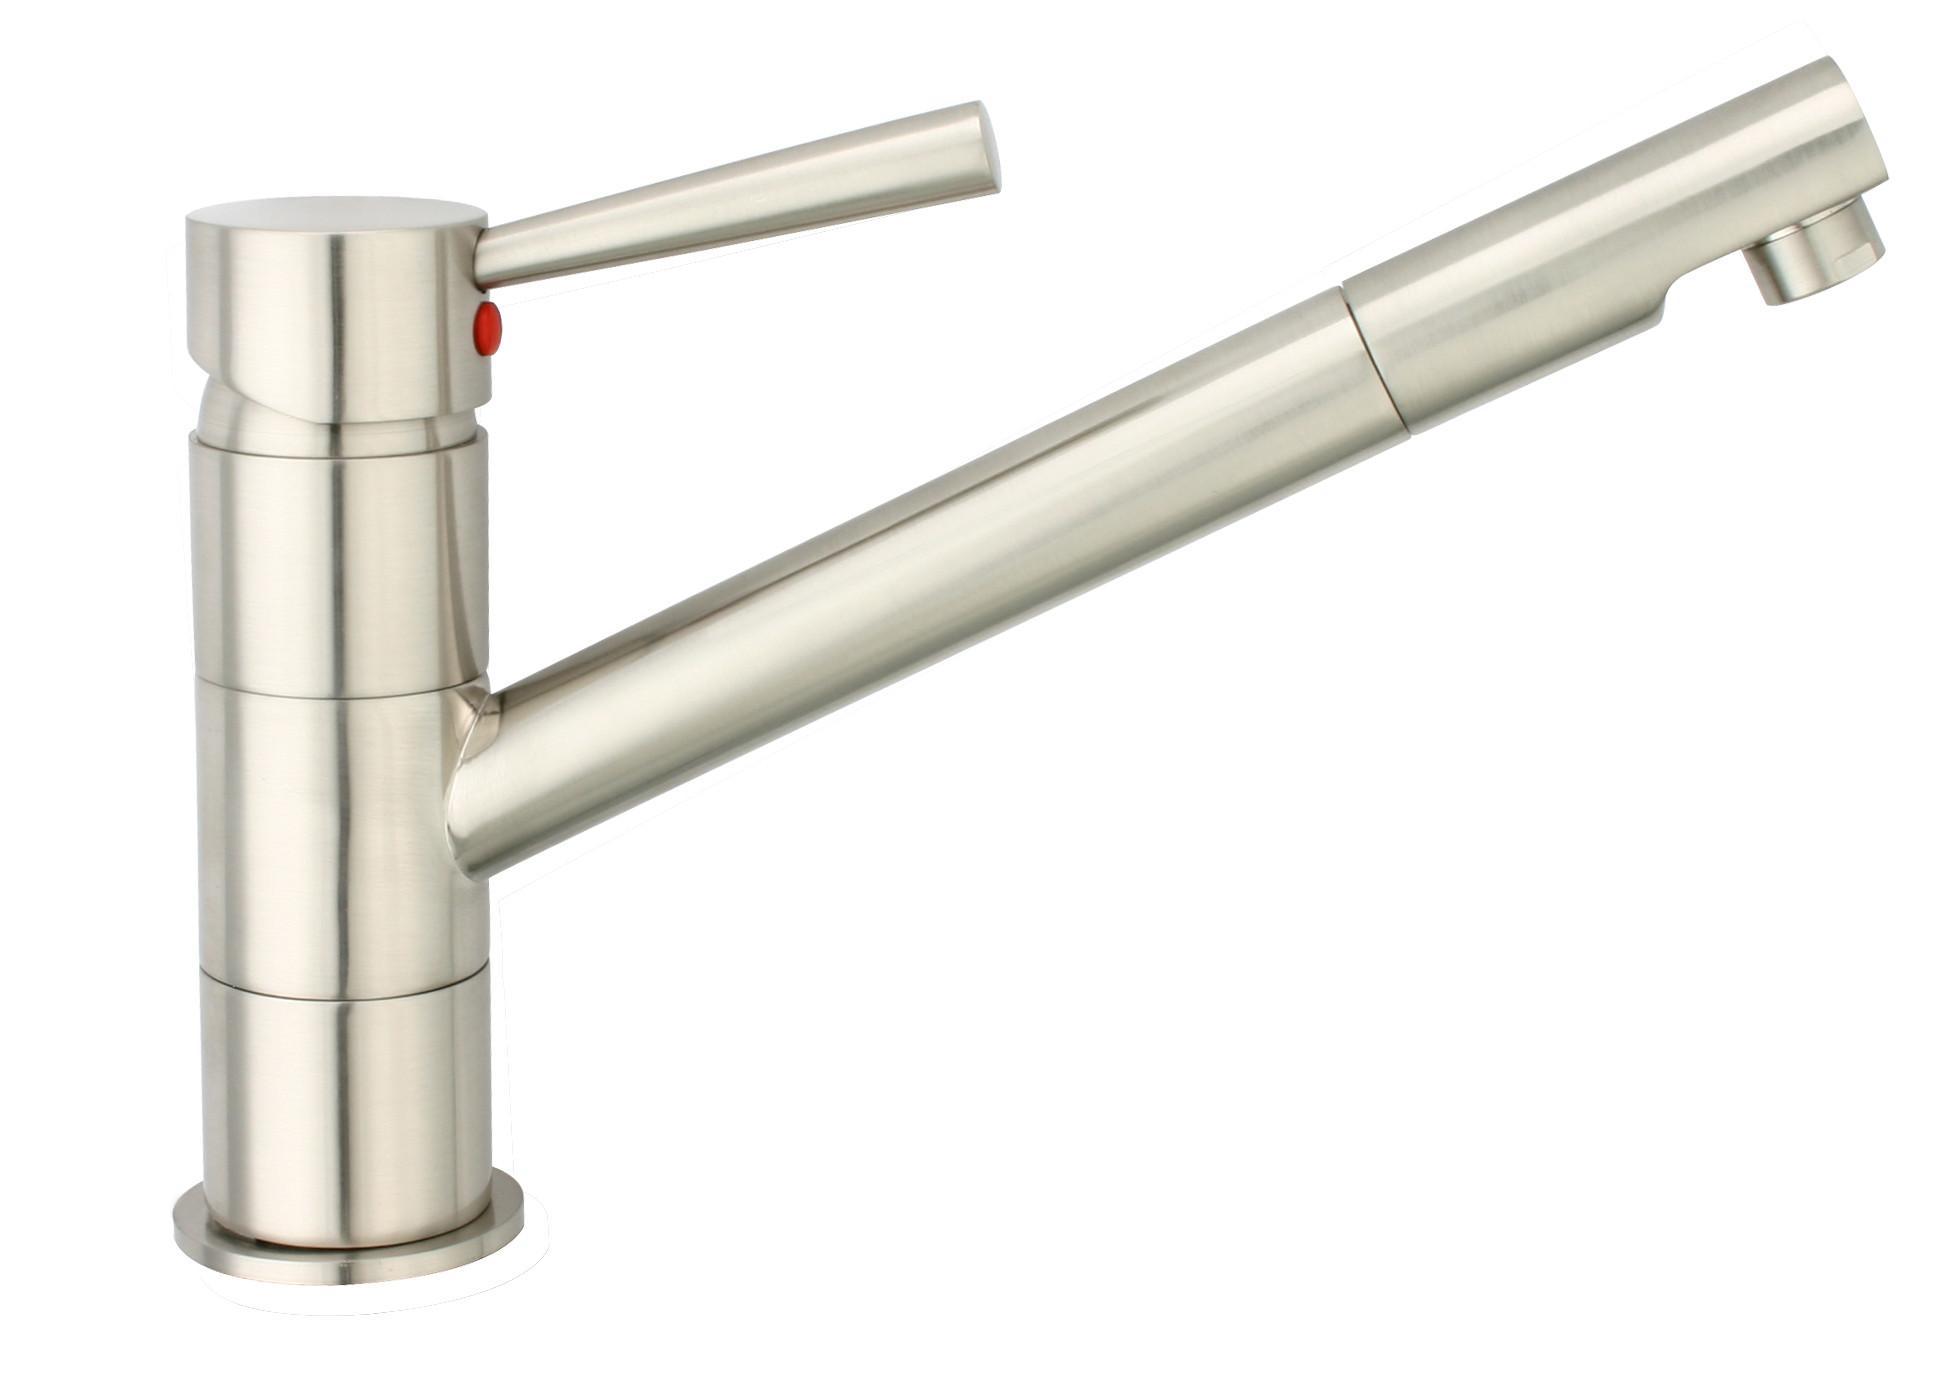 Spültischarmatur Cornwallin Edelstahlfarben - Edelstahlfarben, LIFESTYLE, Kunststoff/Metall (18cm)